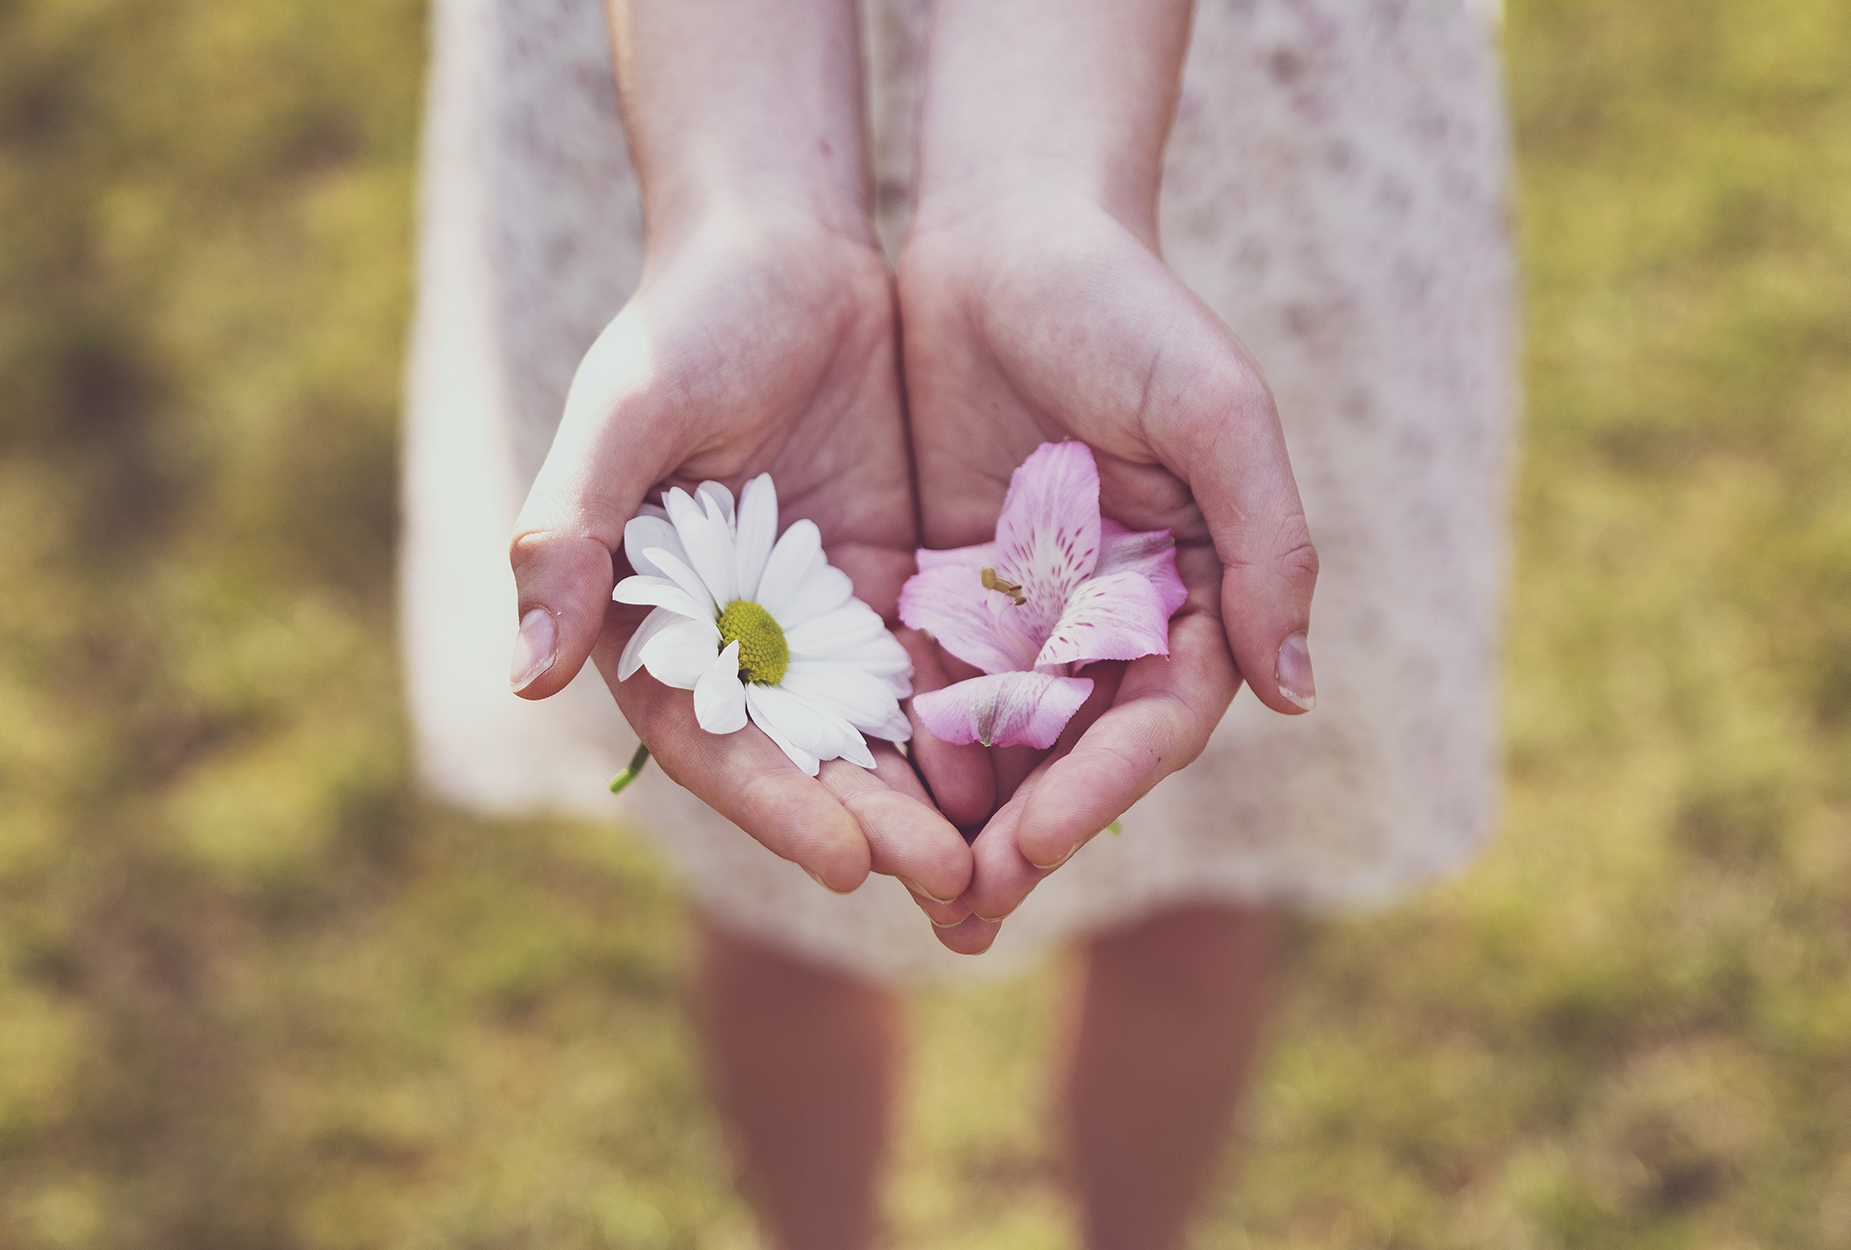 Blomma i hand KyrkA